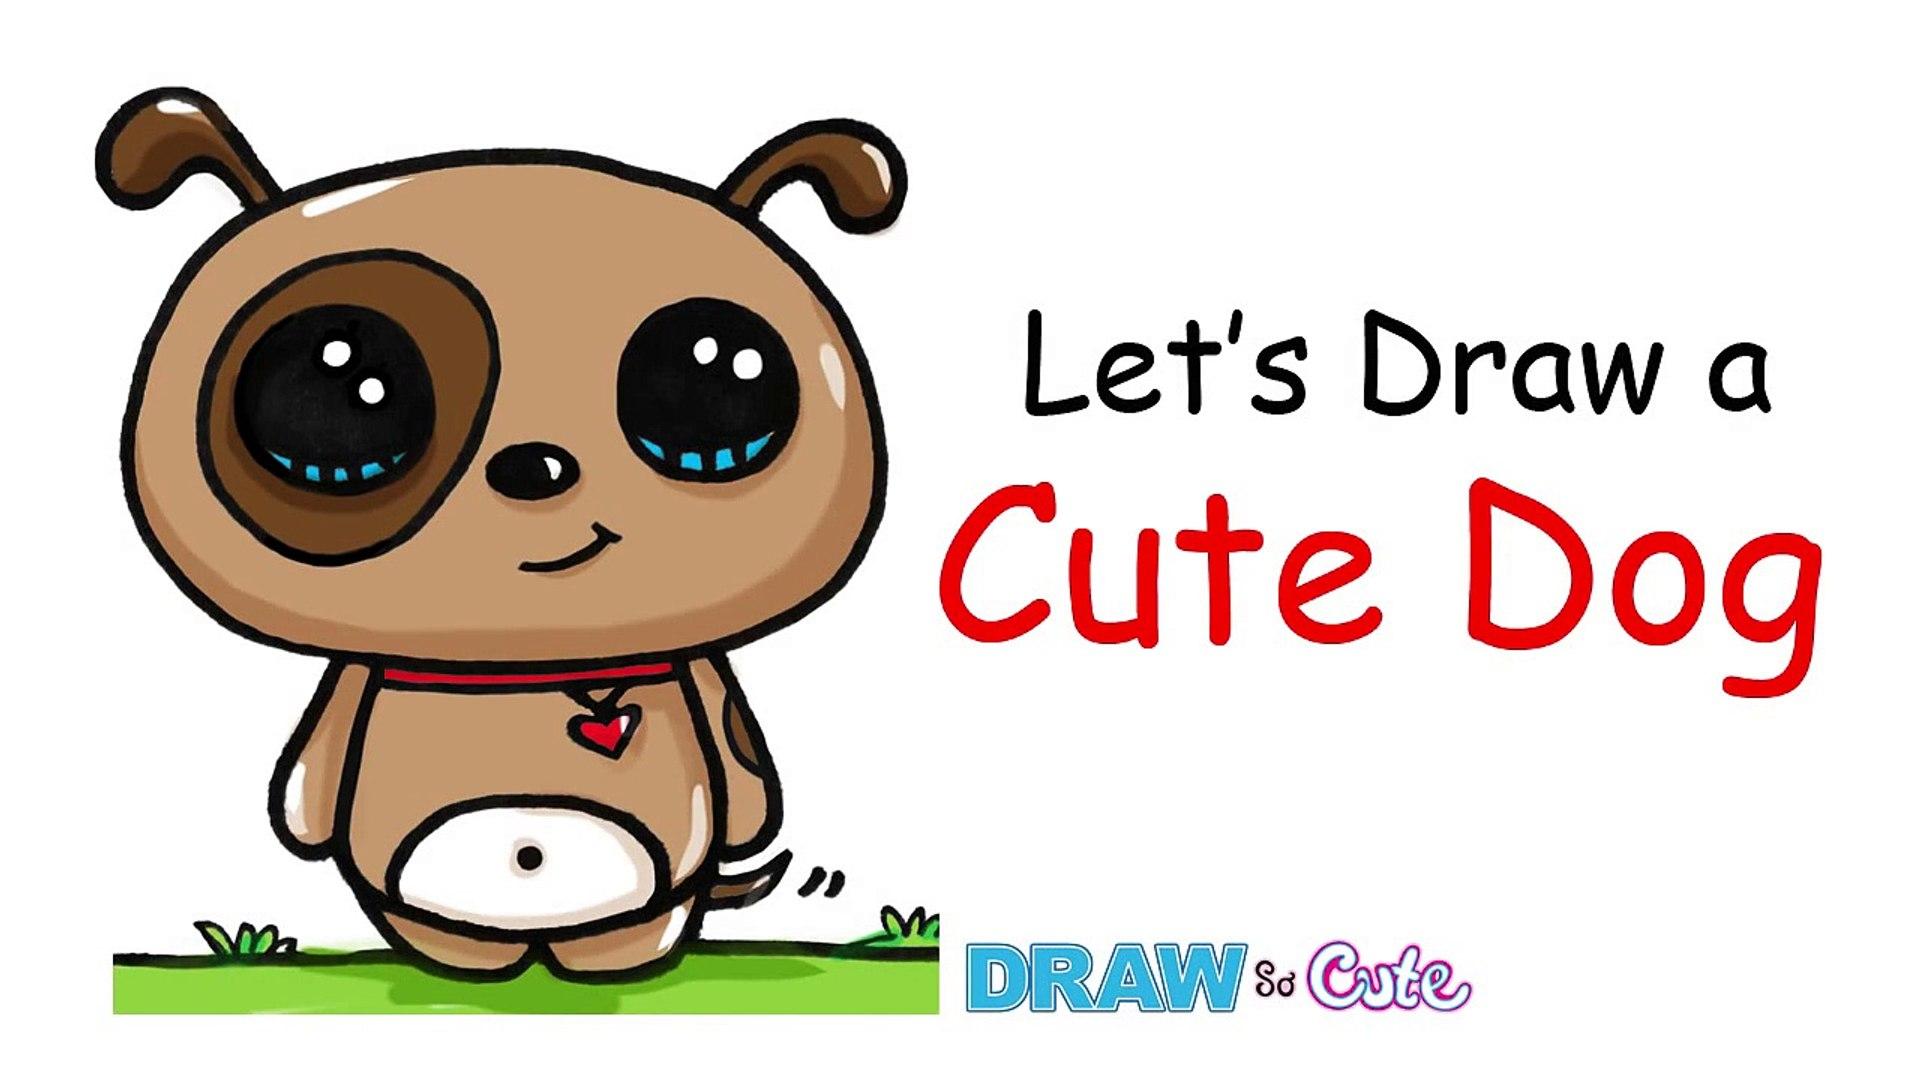 1920x1080 Cute Dog Drawings Tumblr Bulldog And Easy Baby Little Christmas